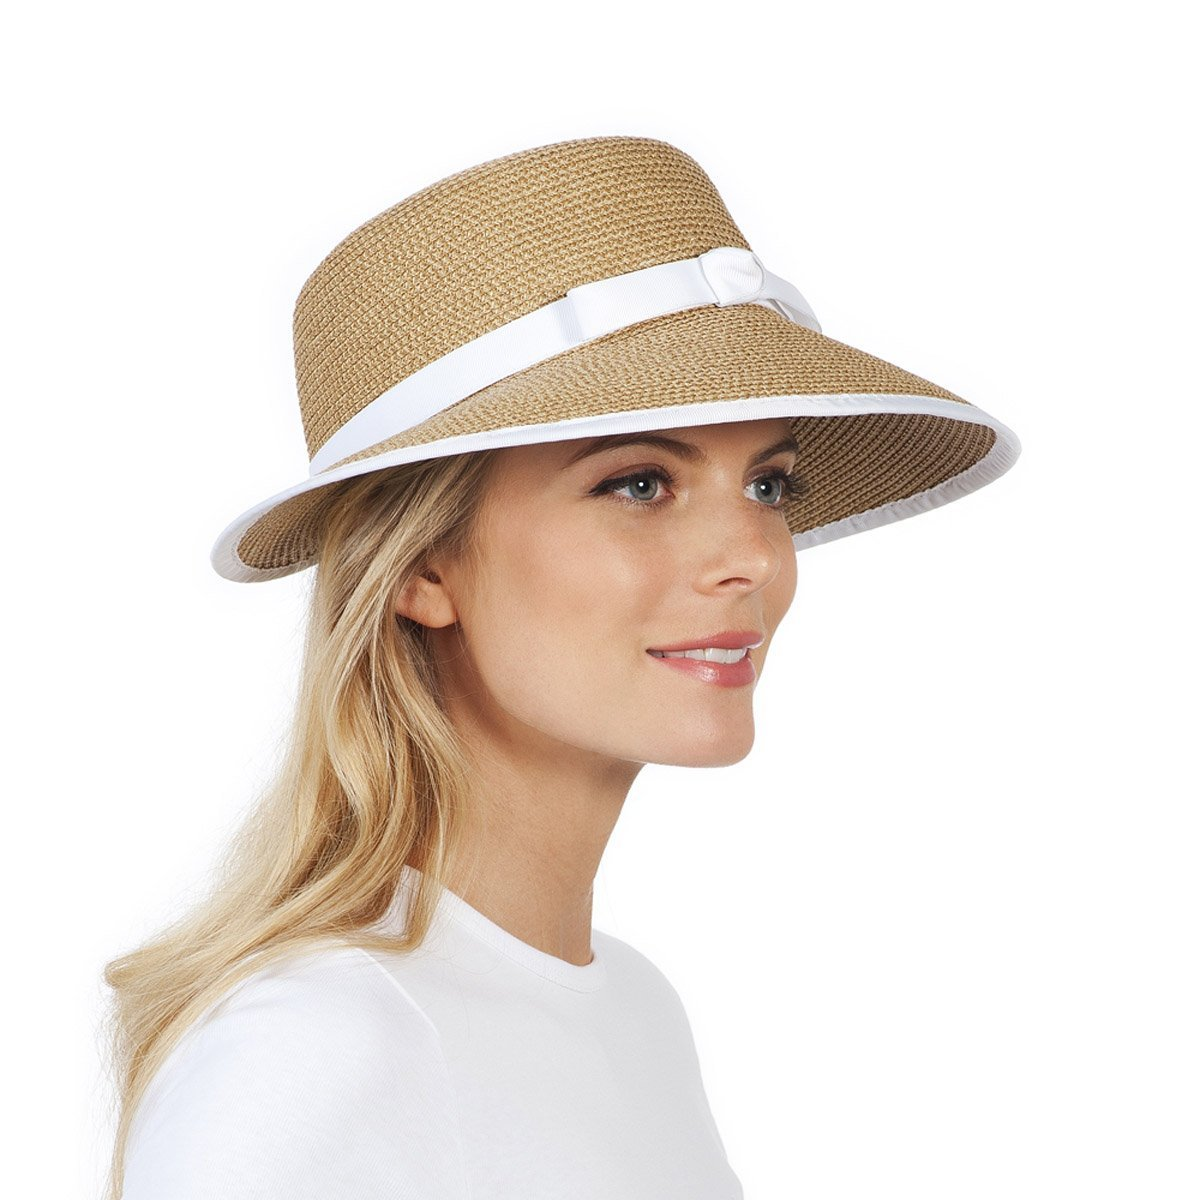 Get Quotations · Eric Javits Luxury Fashion Designer Women s Headwear Hat - Squishee  Cap - Natural White 8dc2f686a666